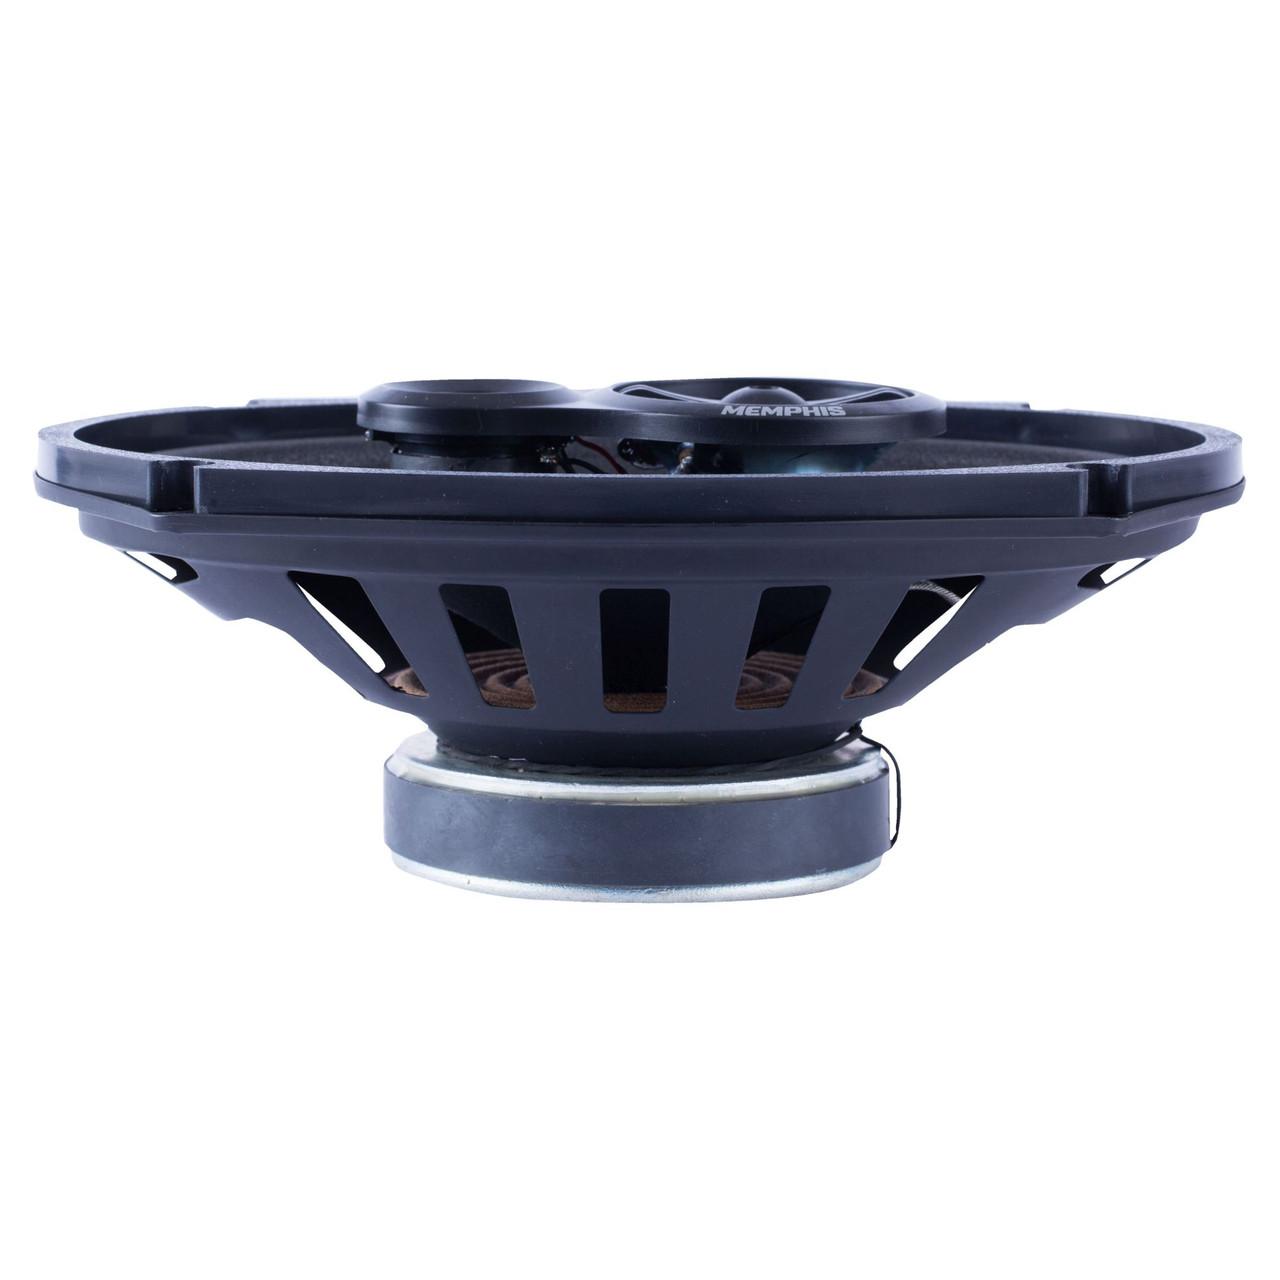 memphis audio srx693 street reference series 6x9 3 way coaxial speakers pair creative audio memphis audio srx693 street reference series 6x9 3 way coaxial speakers pair